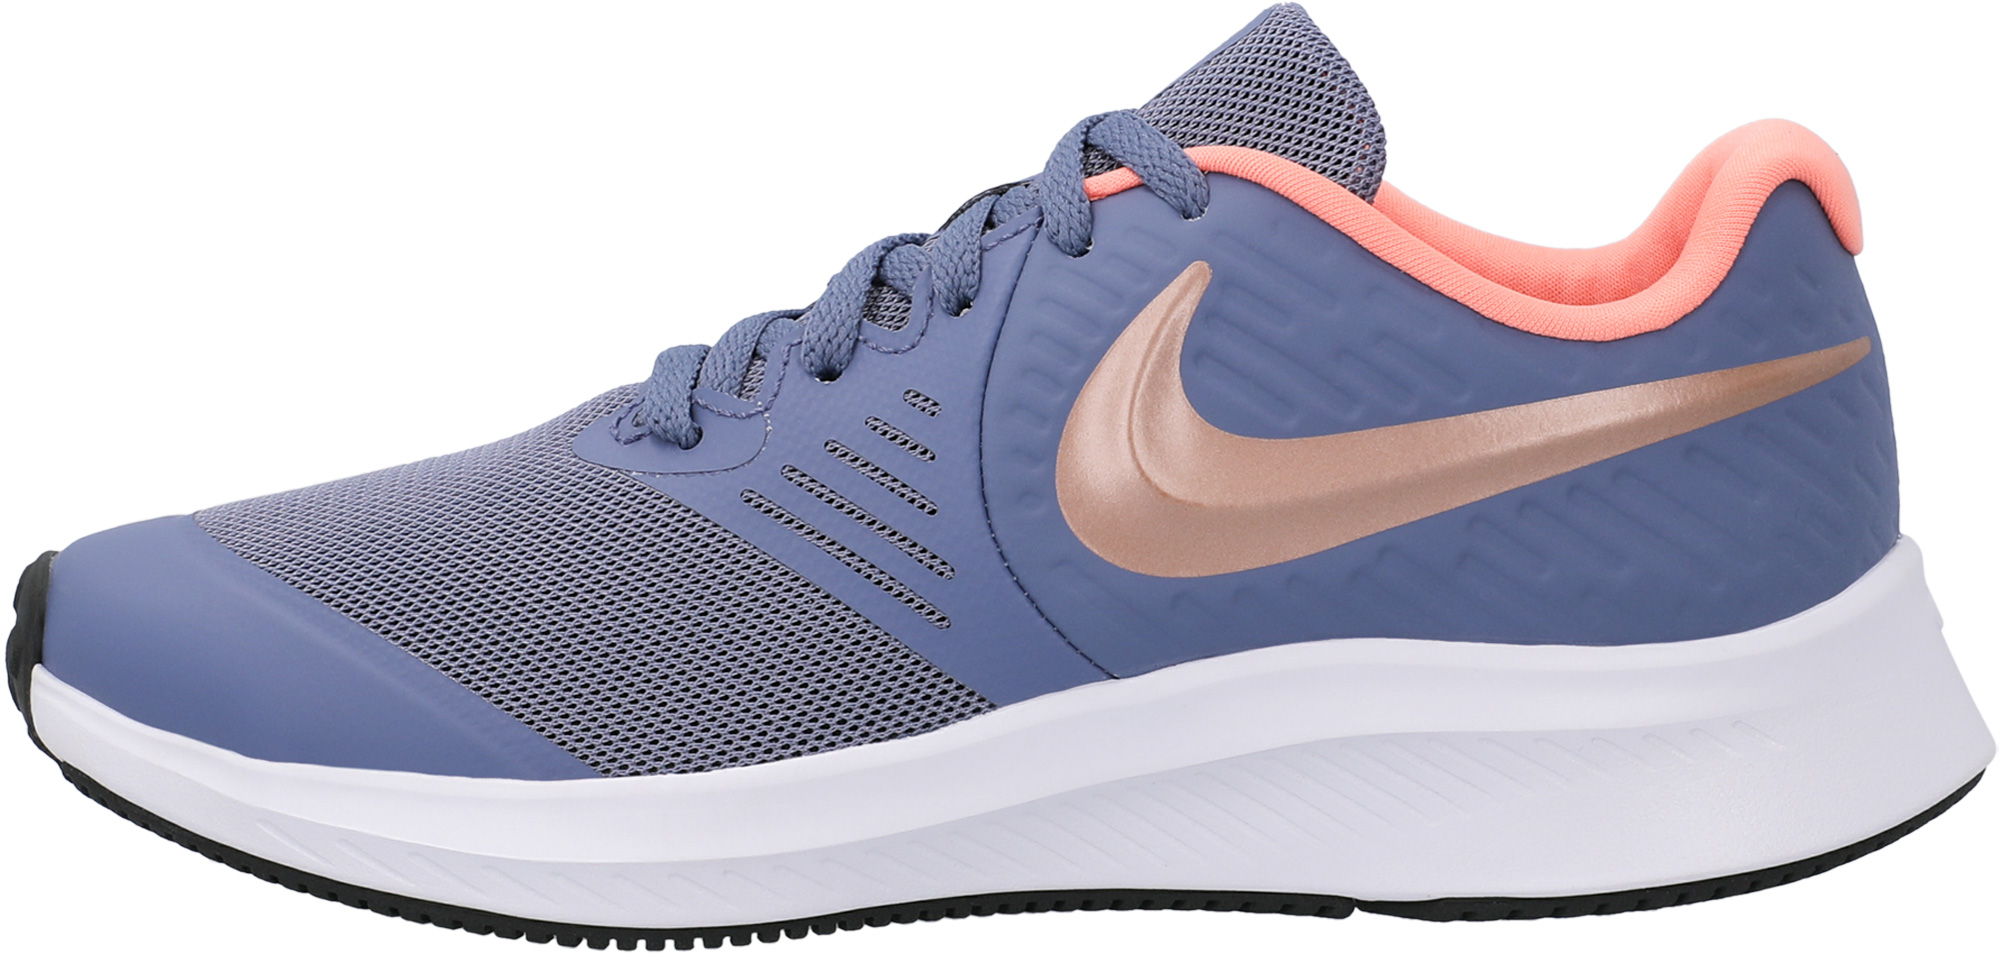 Nike Кроссовки для девочек Nike Star Runner 2 (GS), размер 38 кроссовки nike cortez basic ltr se gs shoe girls aa3043 001